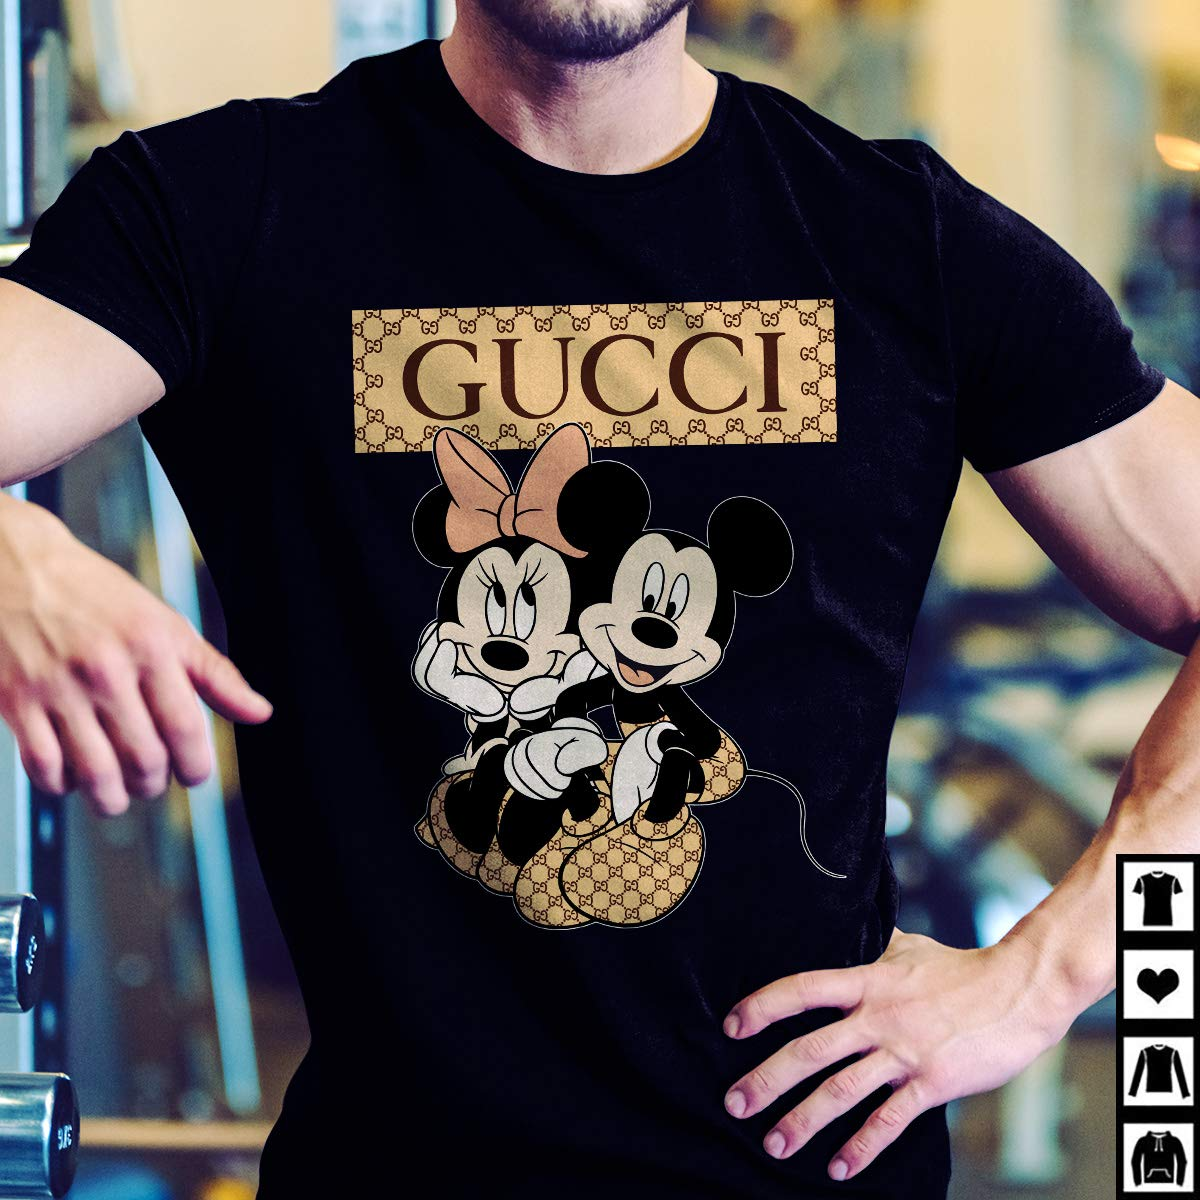 cbcbeba83 Amazon.com: Gucci Disney Juniors Mickey Minnie Mouse Kissing Shirt Gray:  Handmade